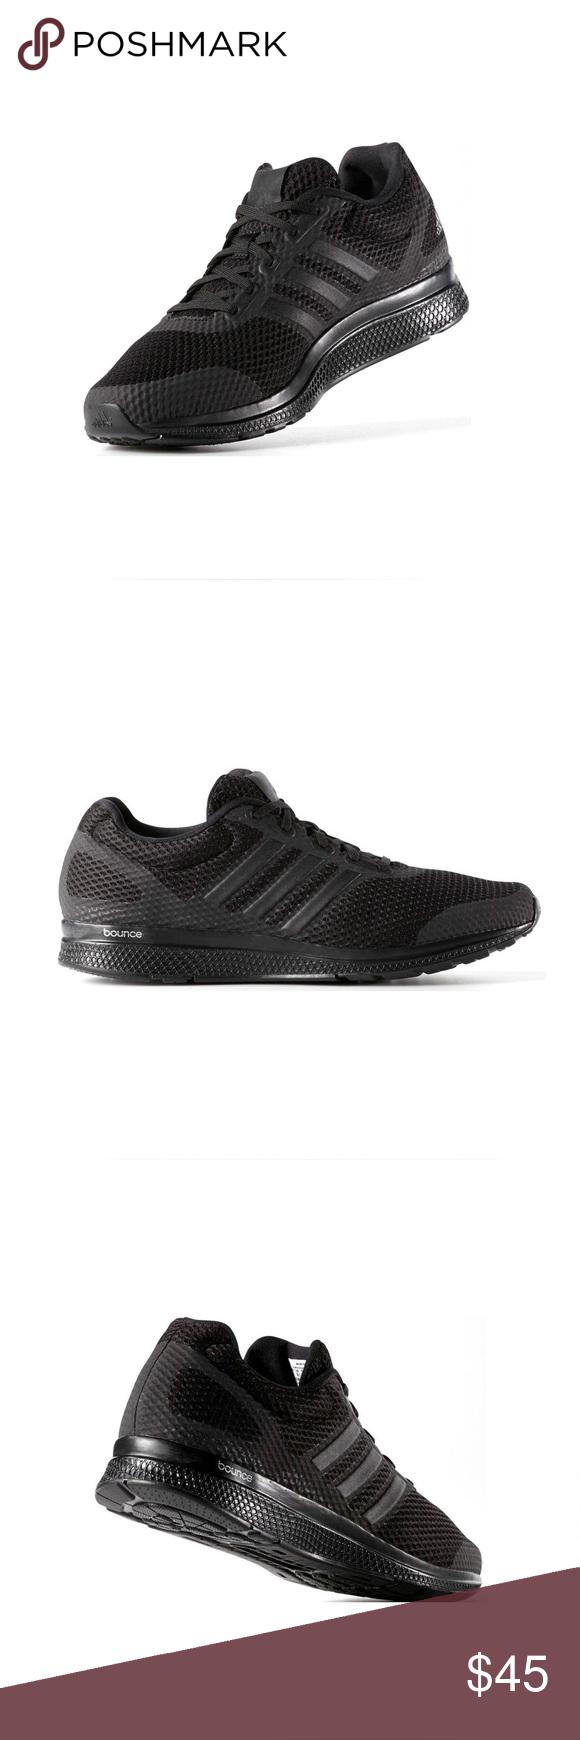 d203ea62b Adidas B42431 Mana Bounce Core Black Running Shoes Sleek shoes that combine  lightweight comfort and durability